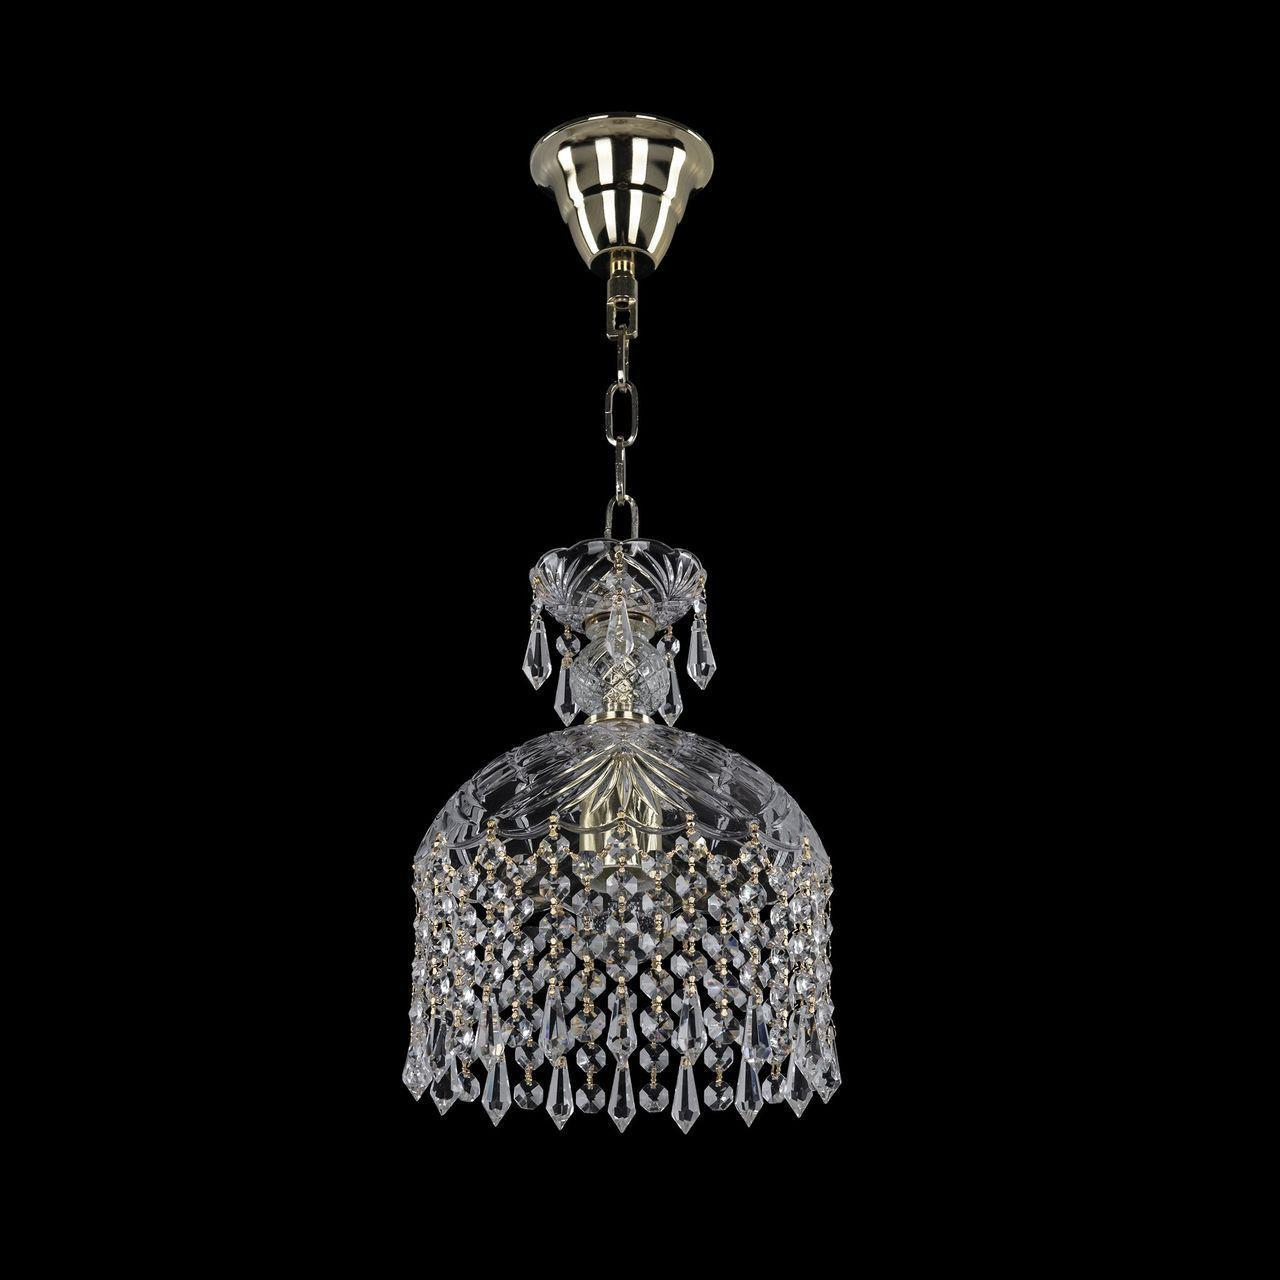 Подвесной светильник Bohemia Ivele 14783/20 G Drops